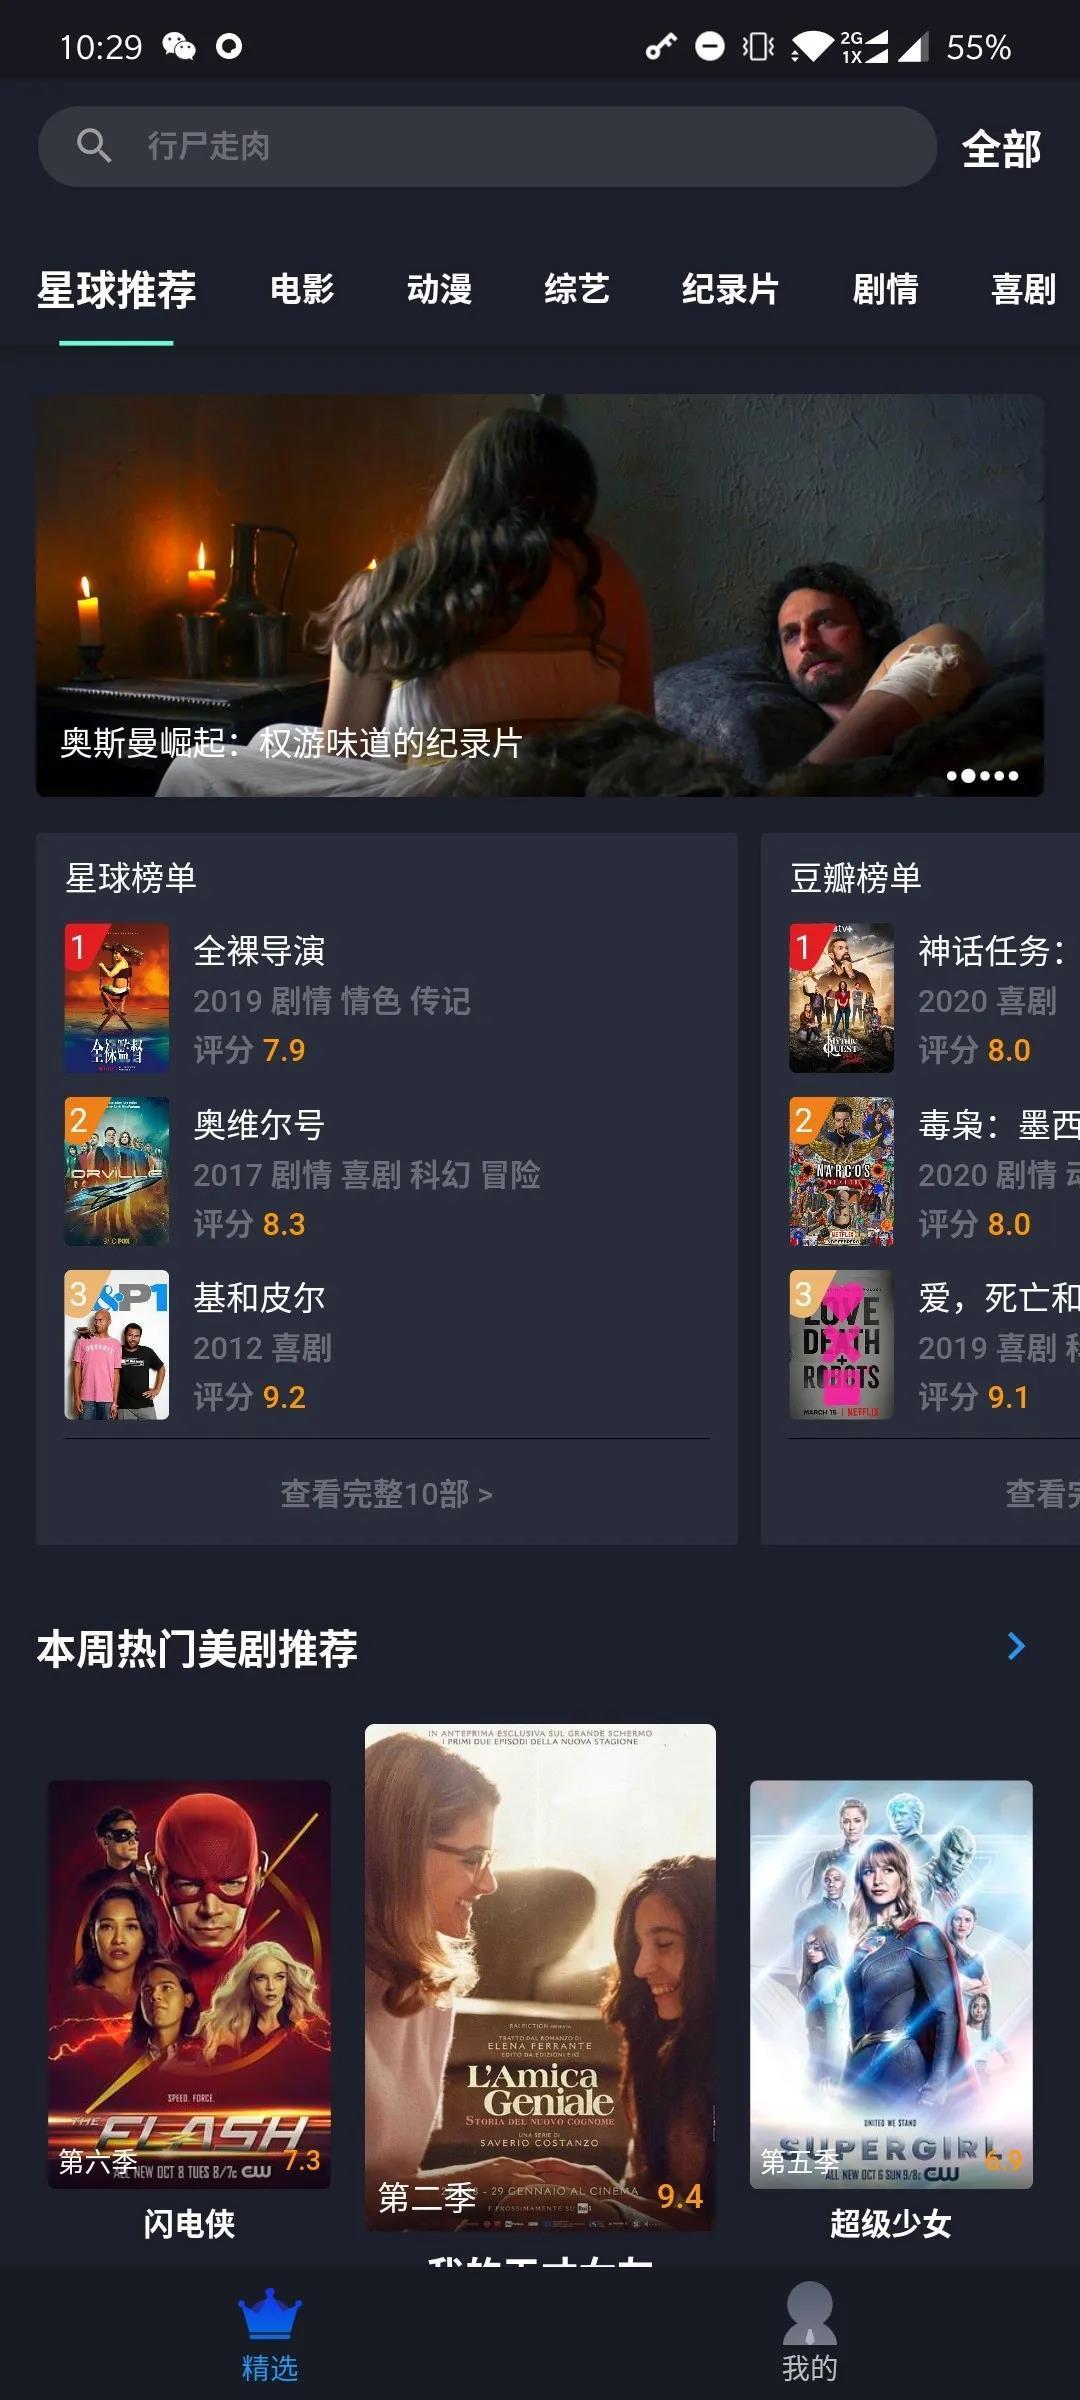 5f18bc0d14195aa594c014be 美剧星球—安卓+iOS